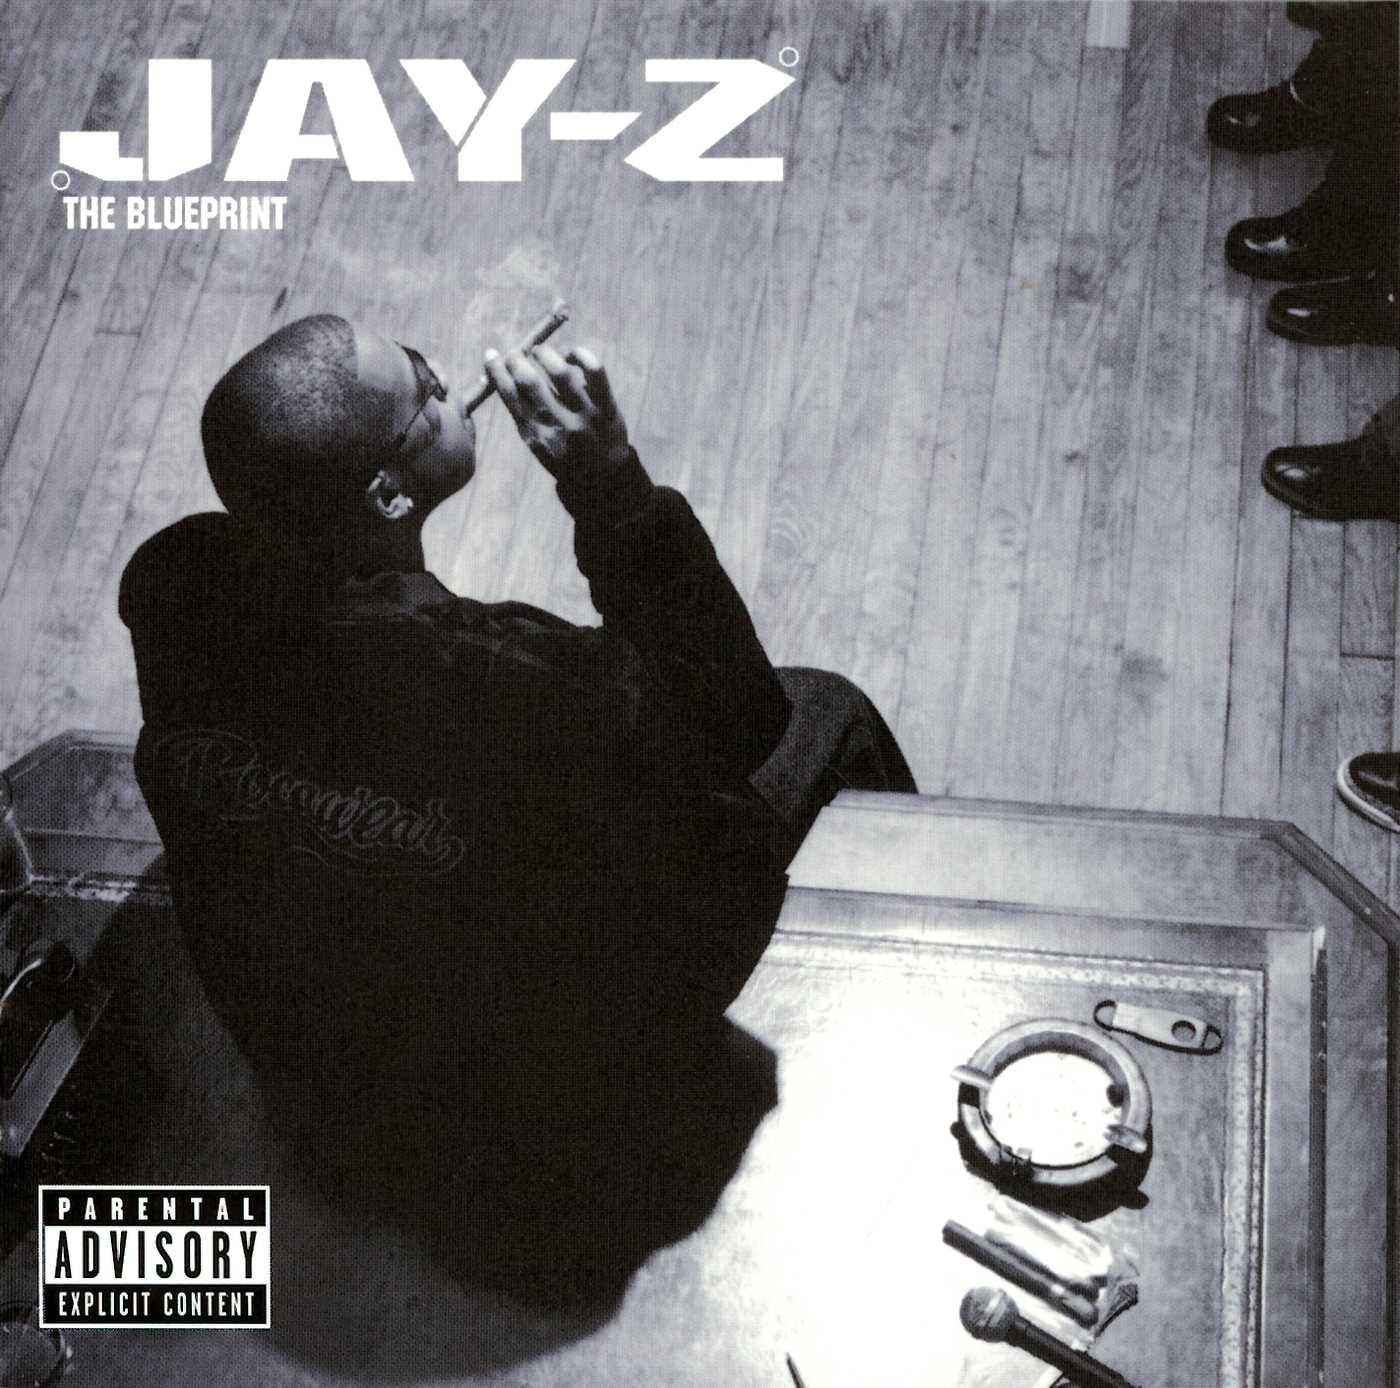 TodayinHip HopHistory:Jay ZDropsHisLandmark'TheBlueprint'AlbumYearsAgo